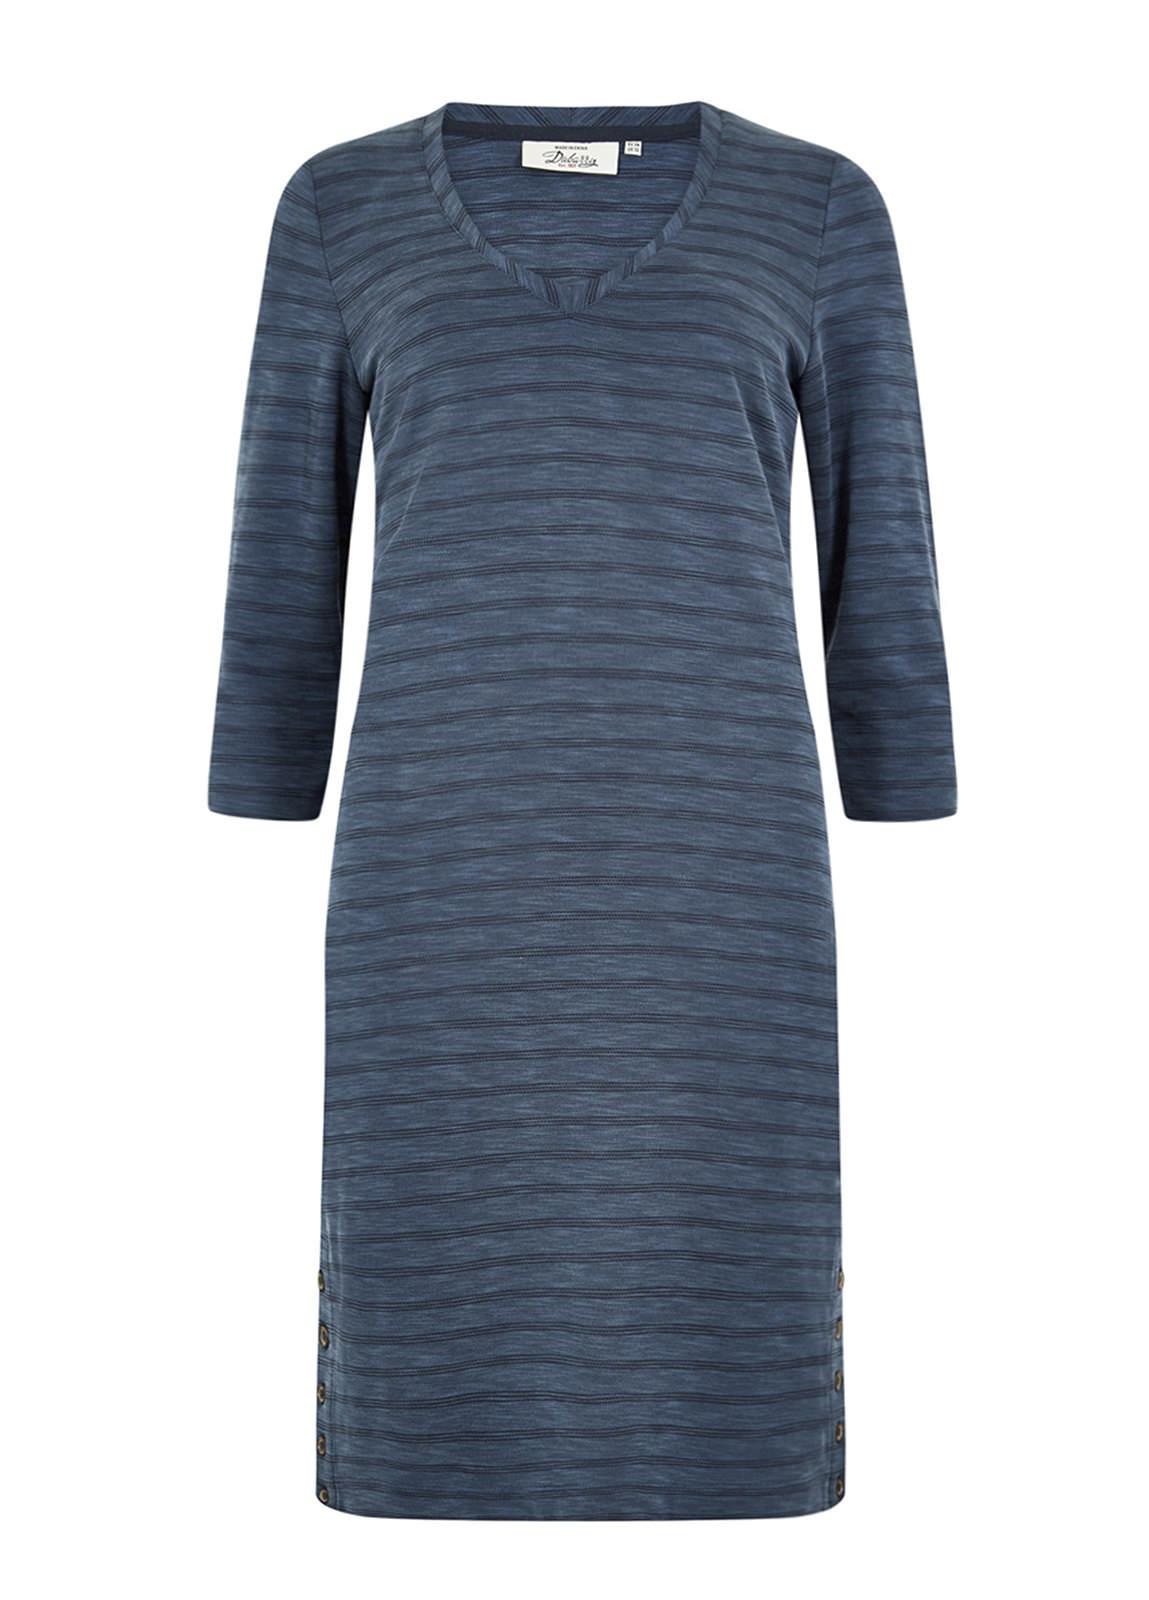 Glenmore Dress - Navy